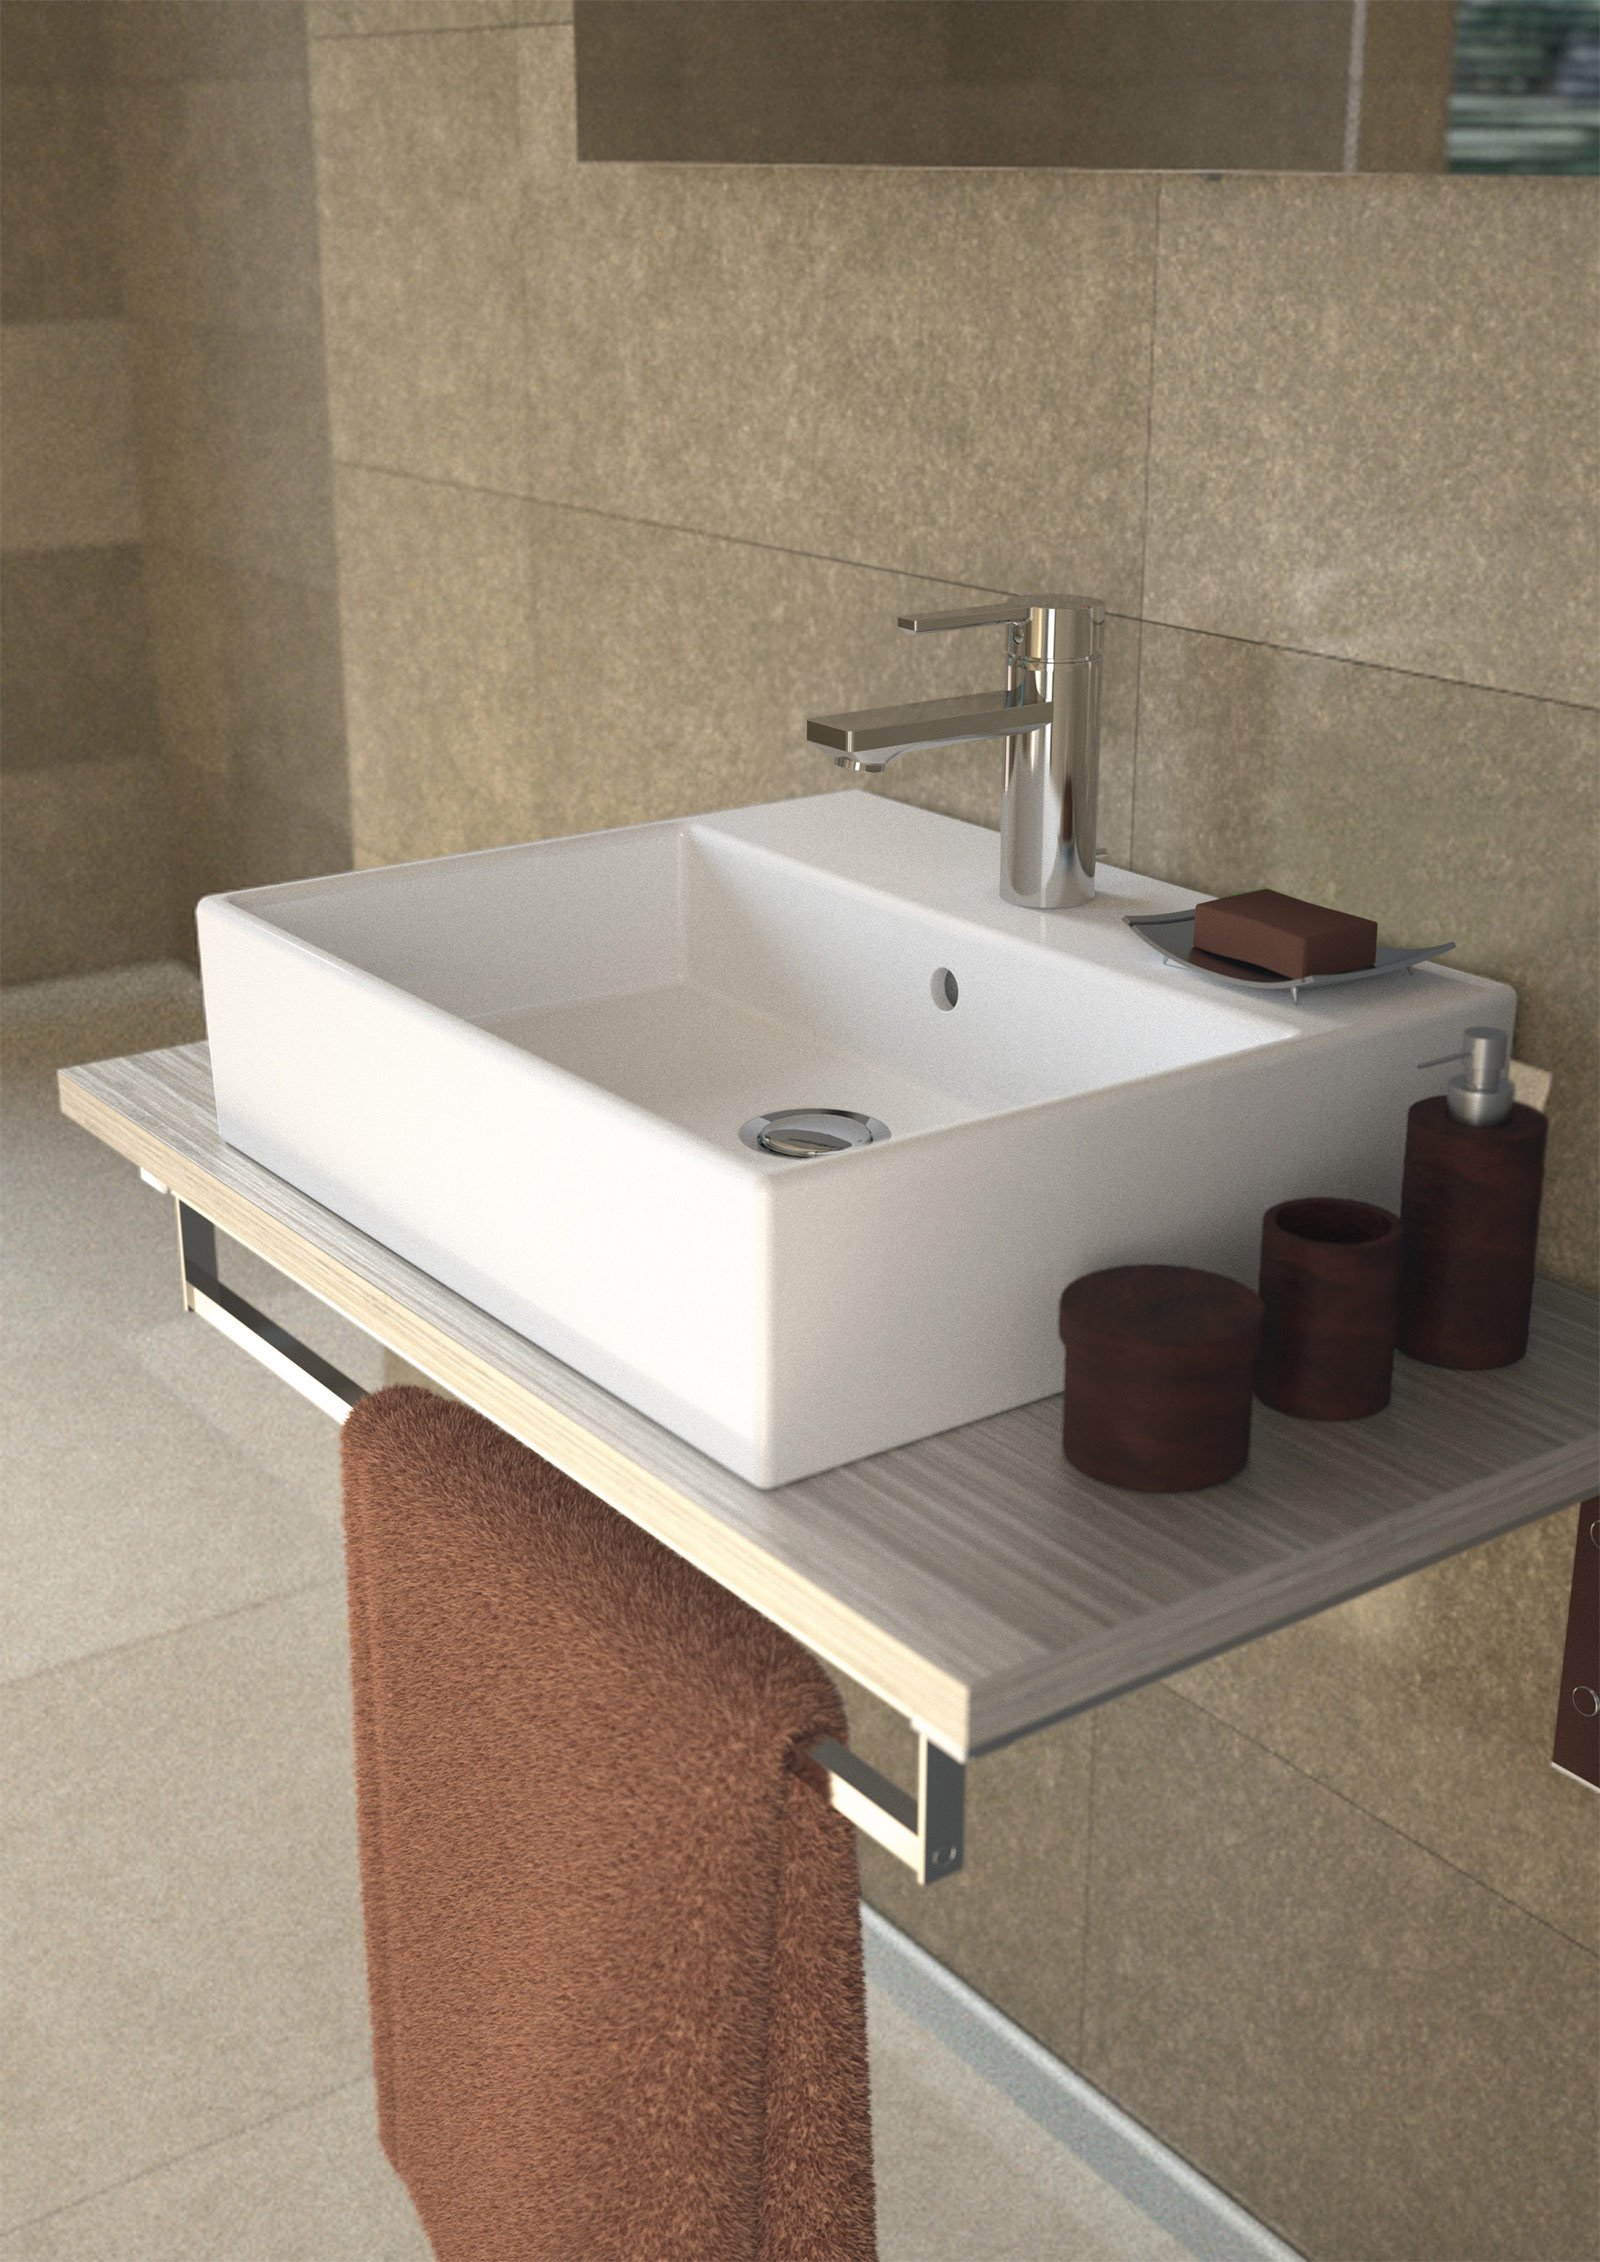 Lavabi low cost - Cose di Casa